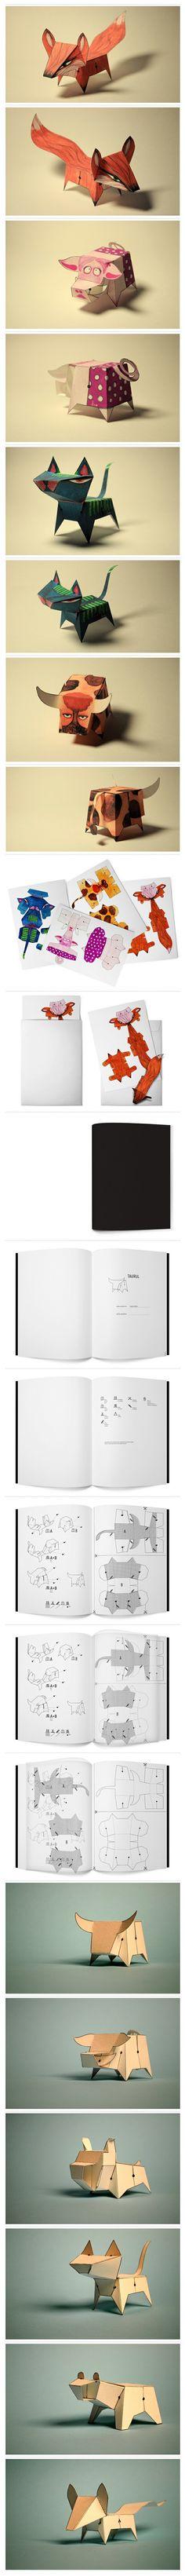 http://www.behance.net/gallery/Glueless-Paper-Animals-(JUST-FOLD)/1121893